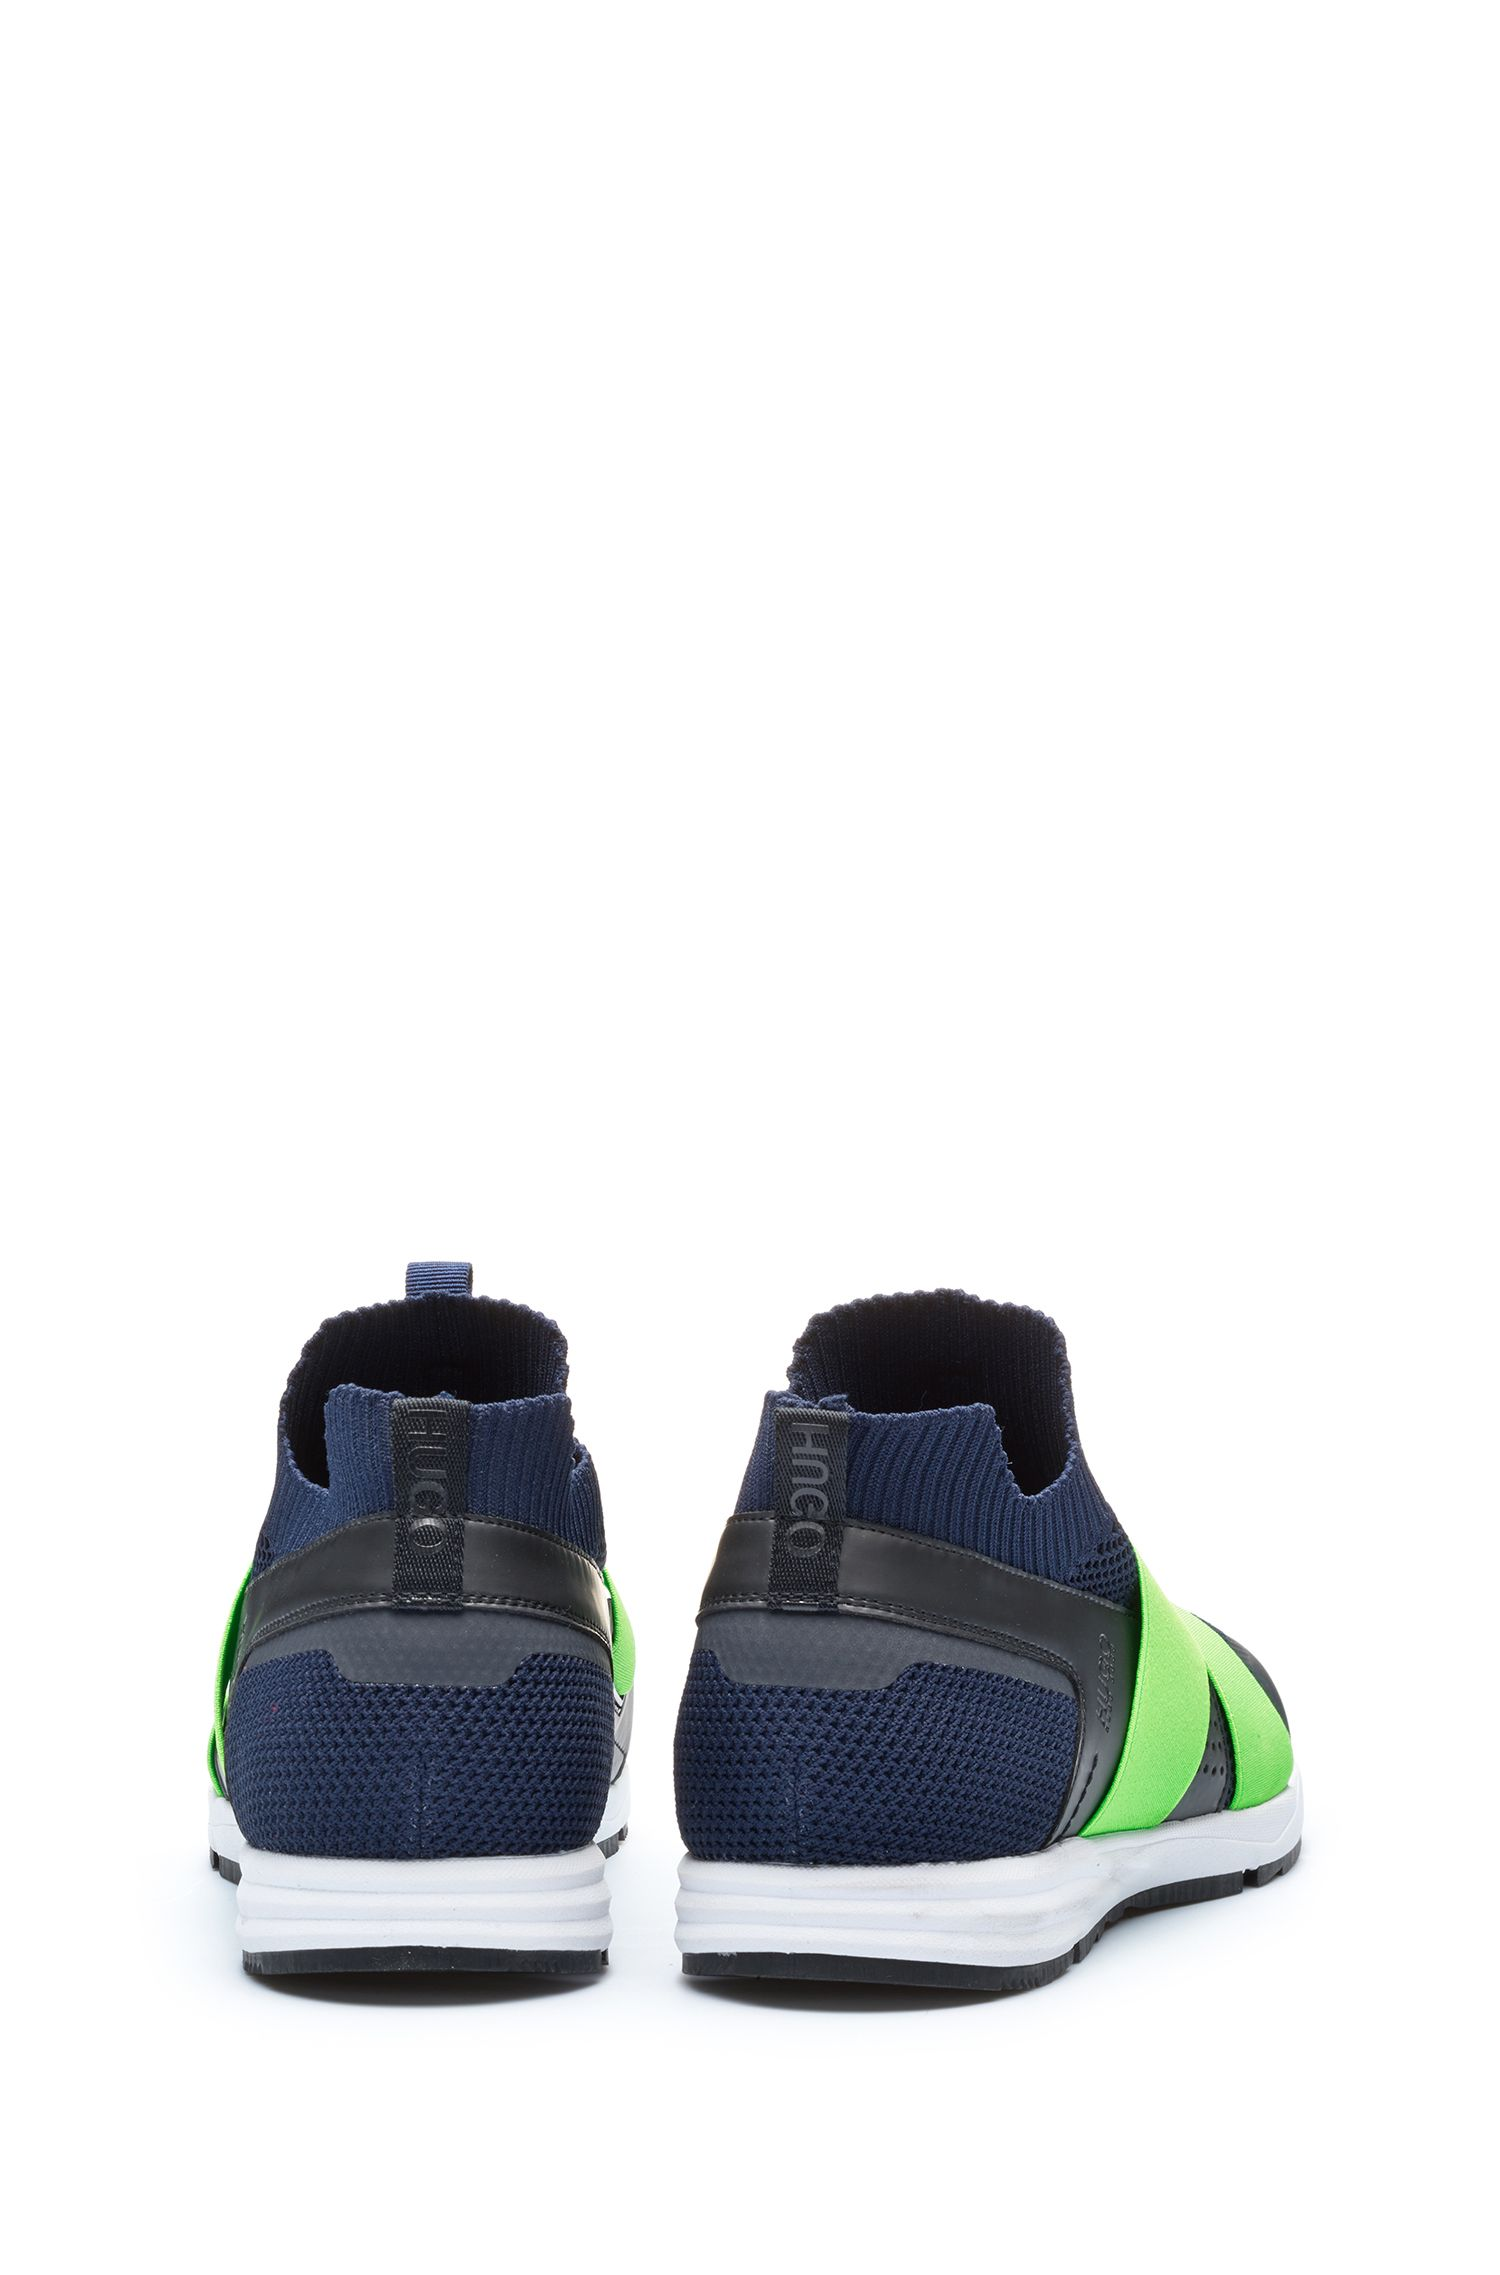 Slip-on hybrid sneakers with Vibram sole, Dark Blue